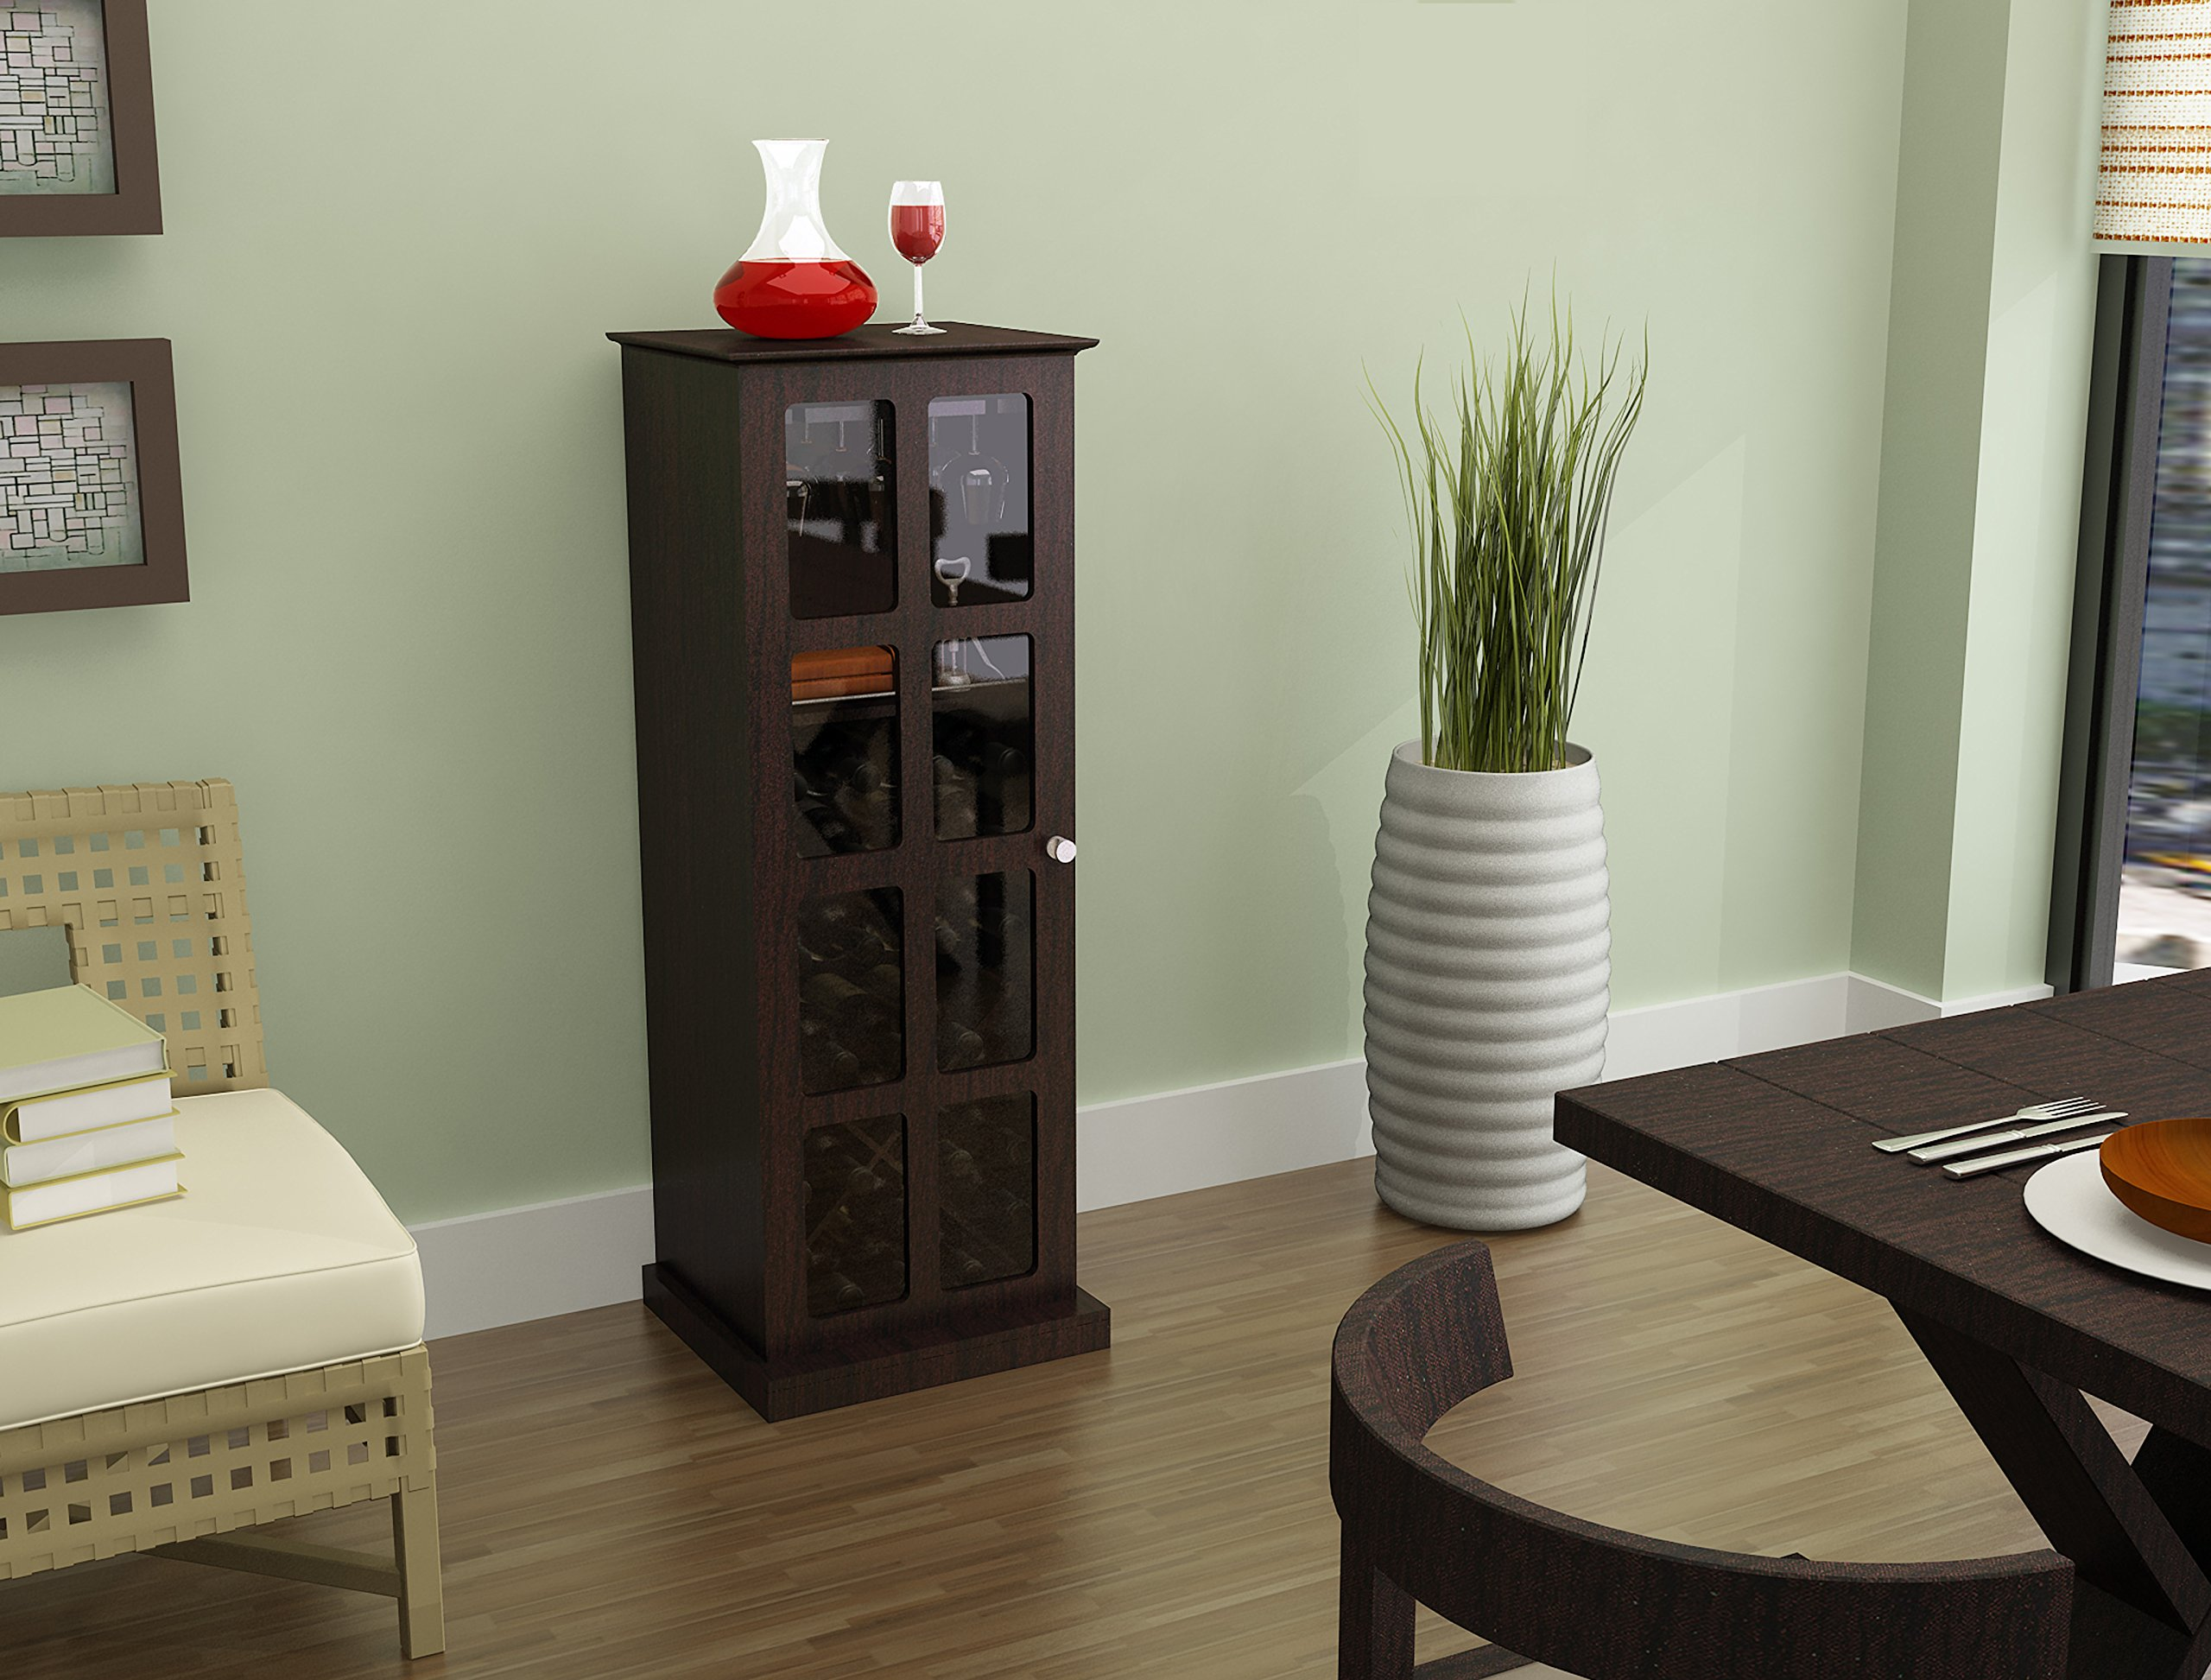 Atlantic Wood Bar Wine Rack Liquor Cabinet with 24 Bottle Holder and Glass Storage, Espresso by Atlantic